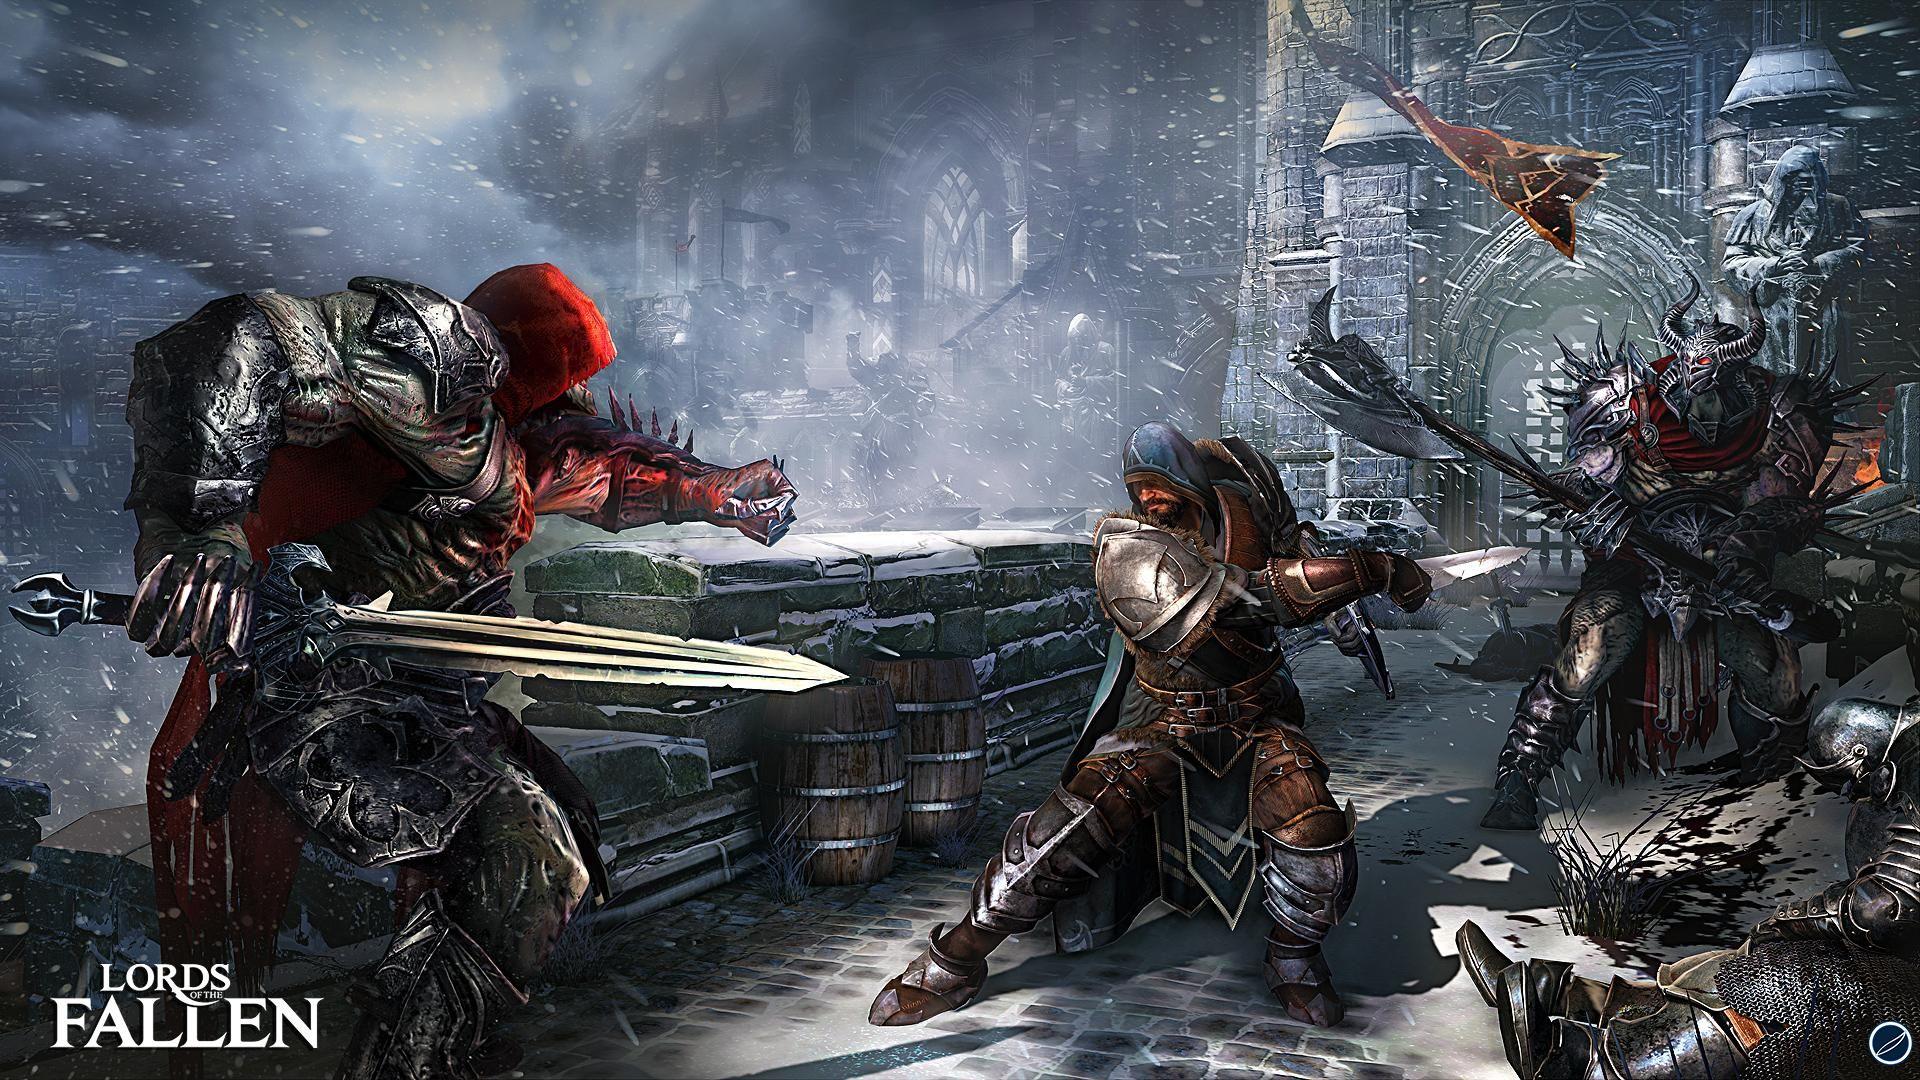 lords-of-the-fallen_XboxOne_w_6027.jpg